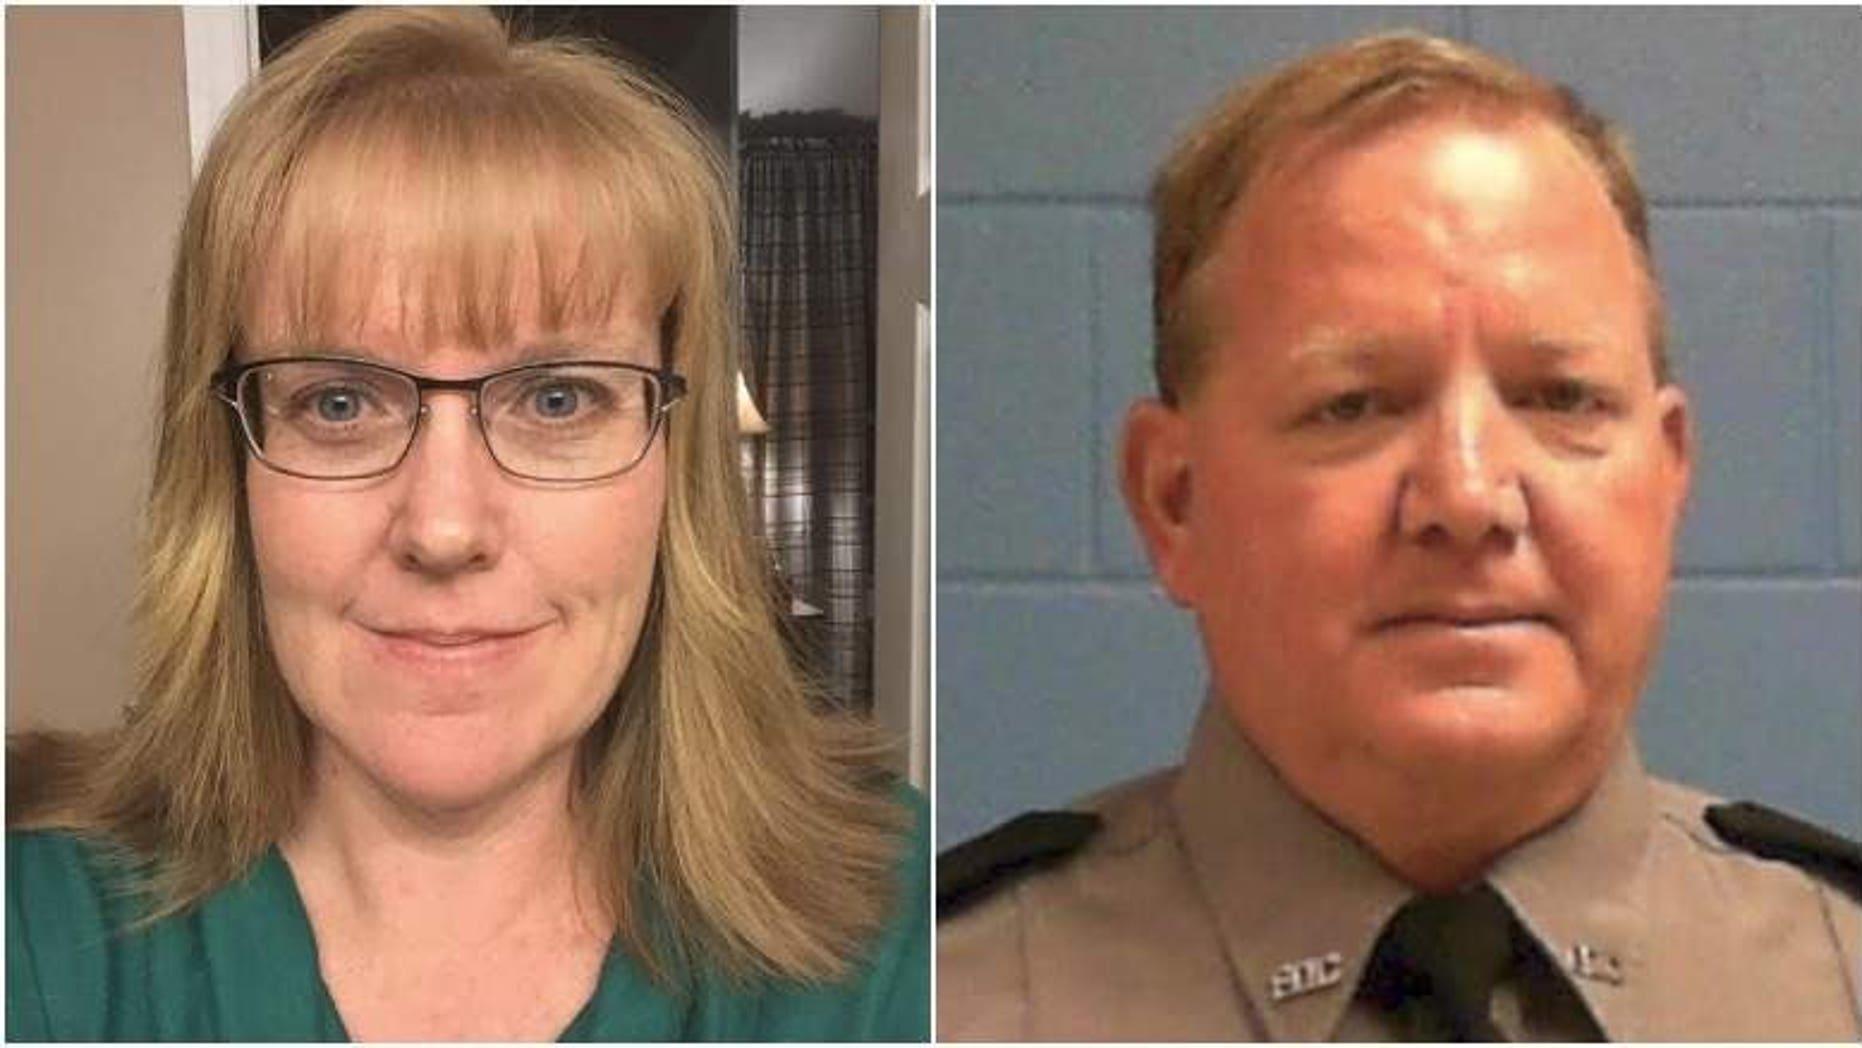 Hardee County Deputy Julie Bridges and Sgt. Joseph Osmann, a corrections officer, were killed in a head-on crash Sunday morning.